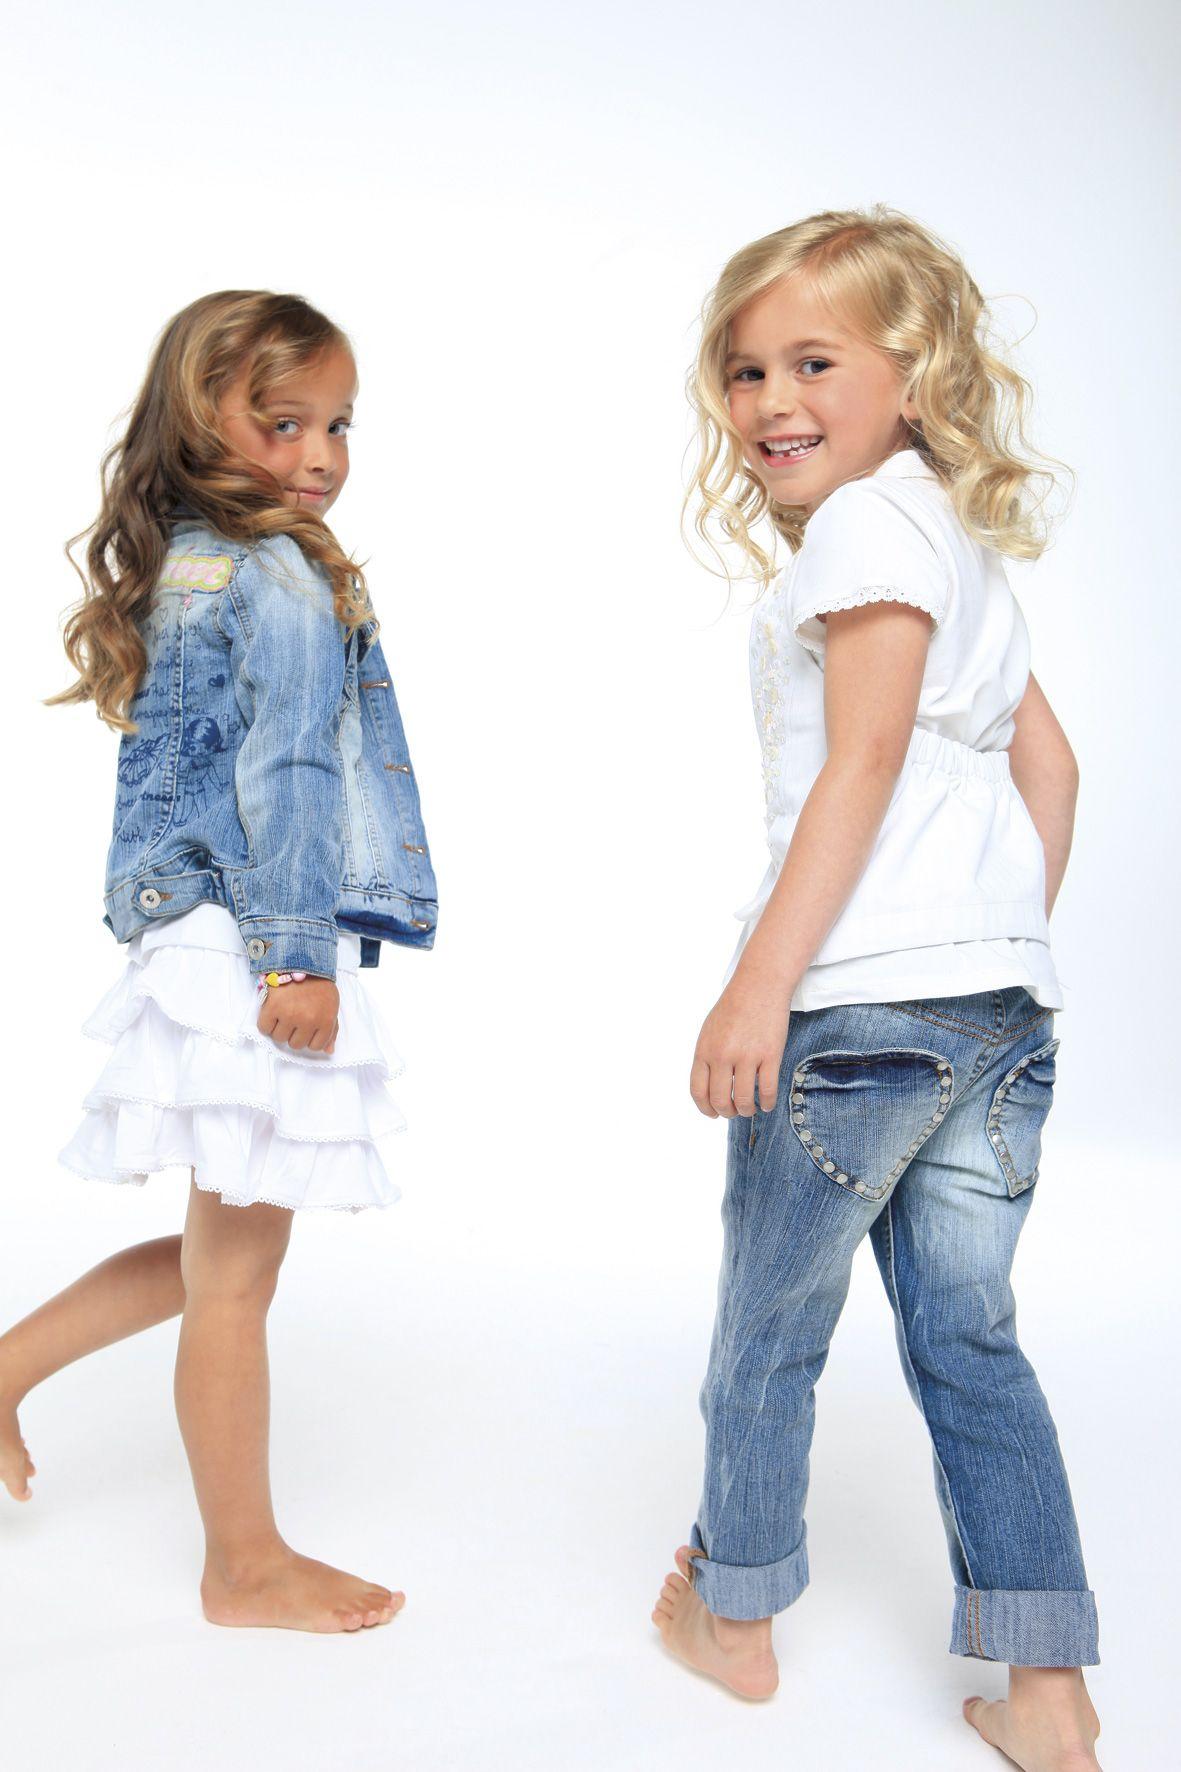 081be26cd1fe MIM-PI best friends #cute #jeans #mimpi #kids #clothes #fashion #girls